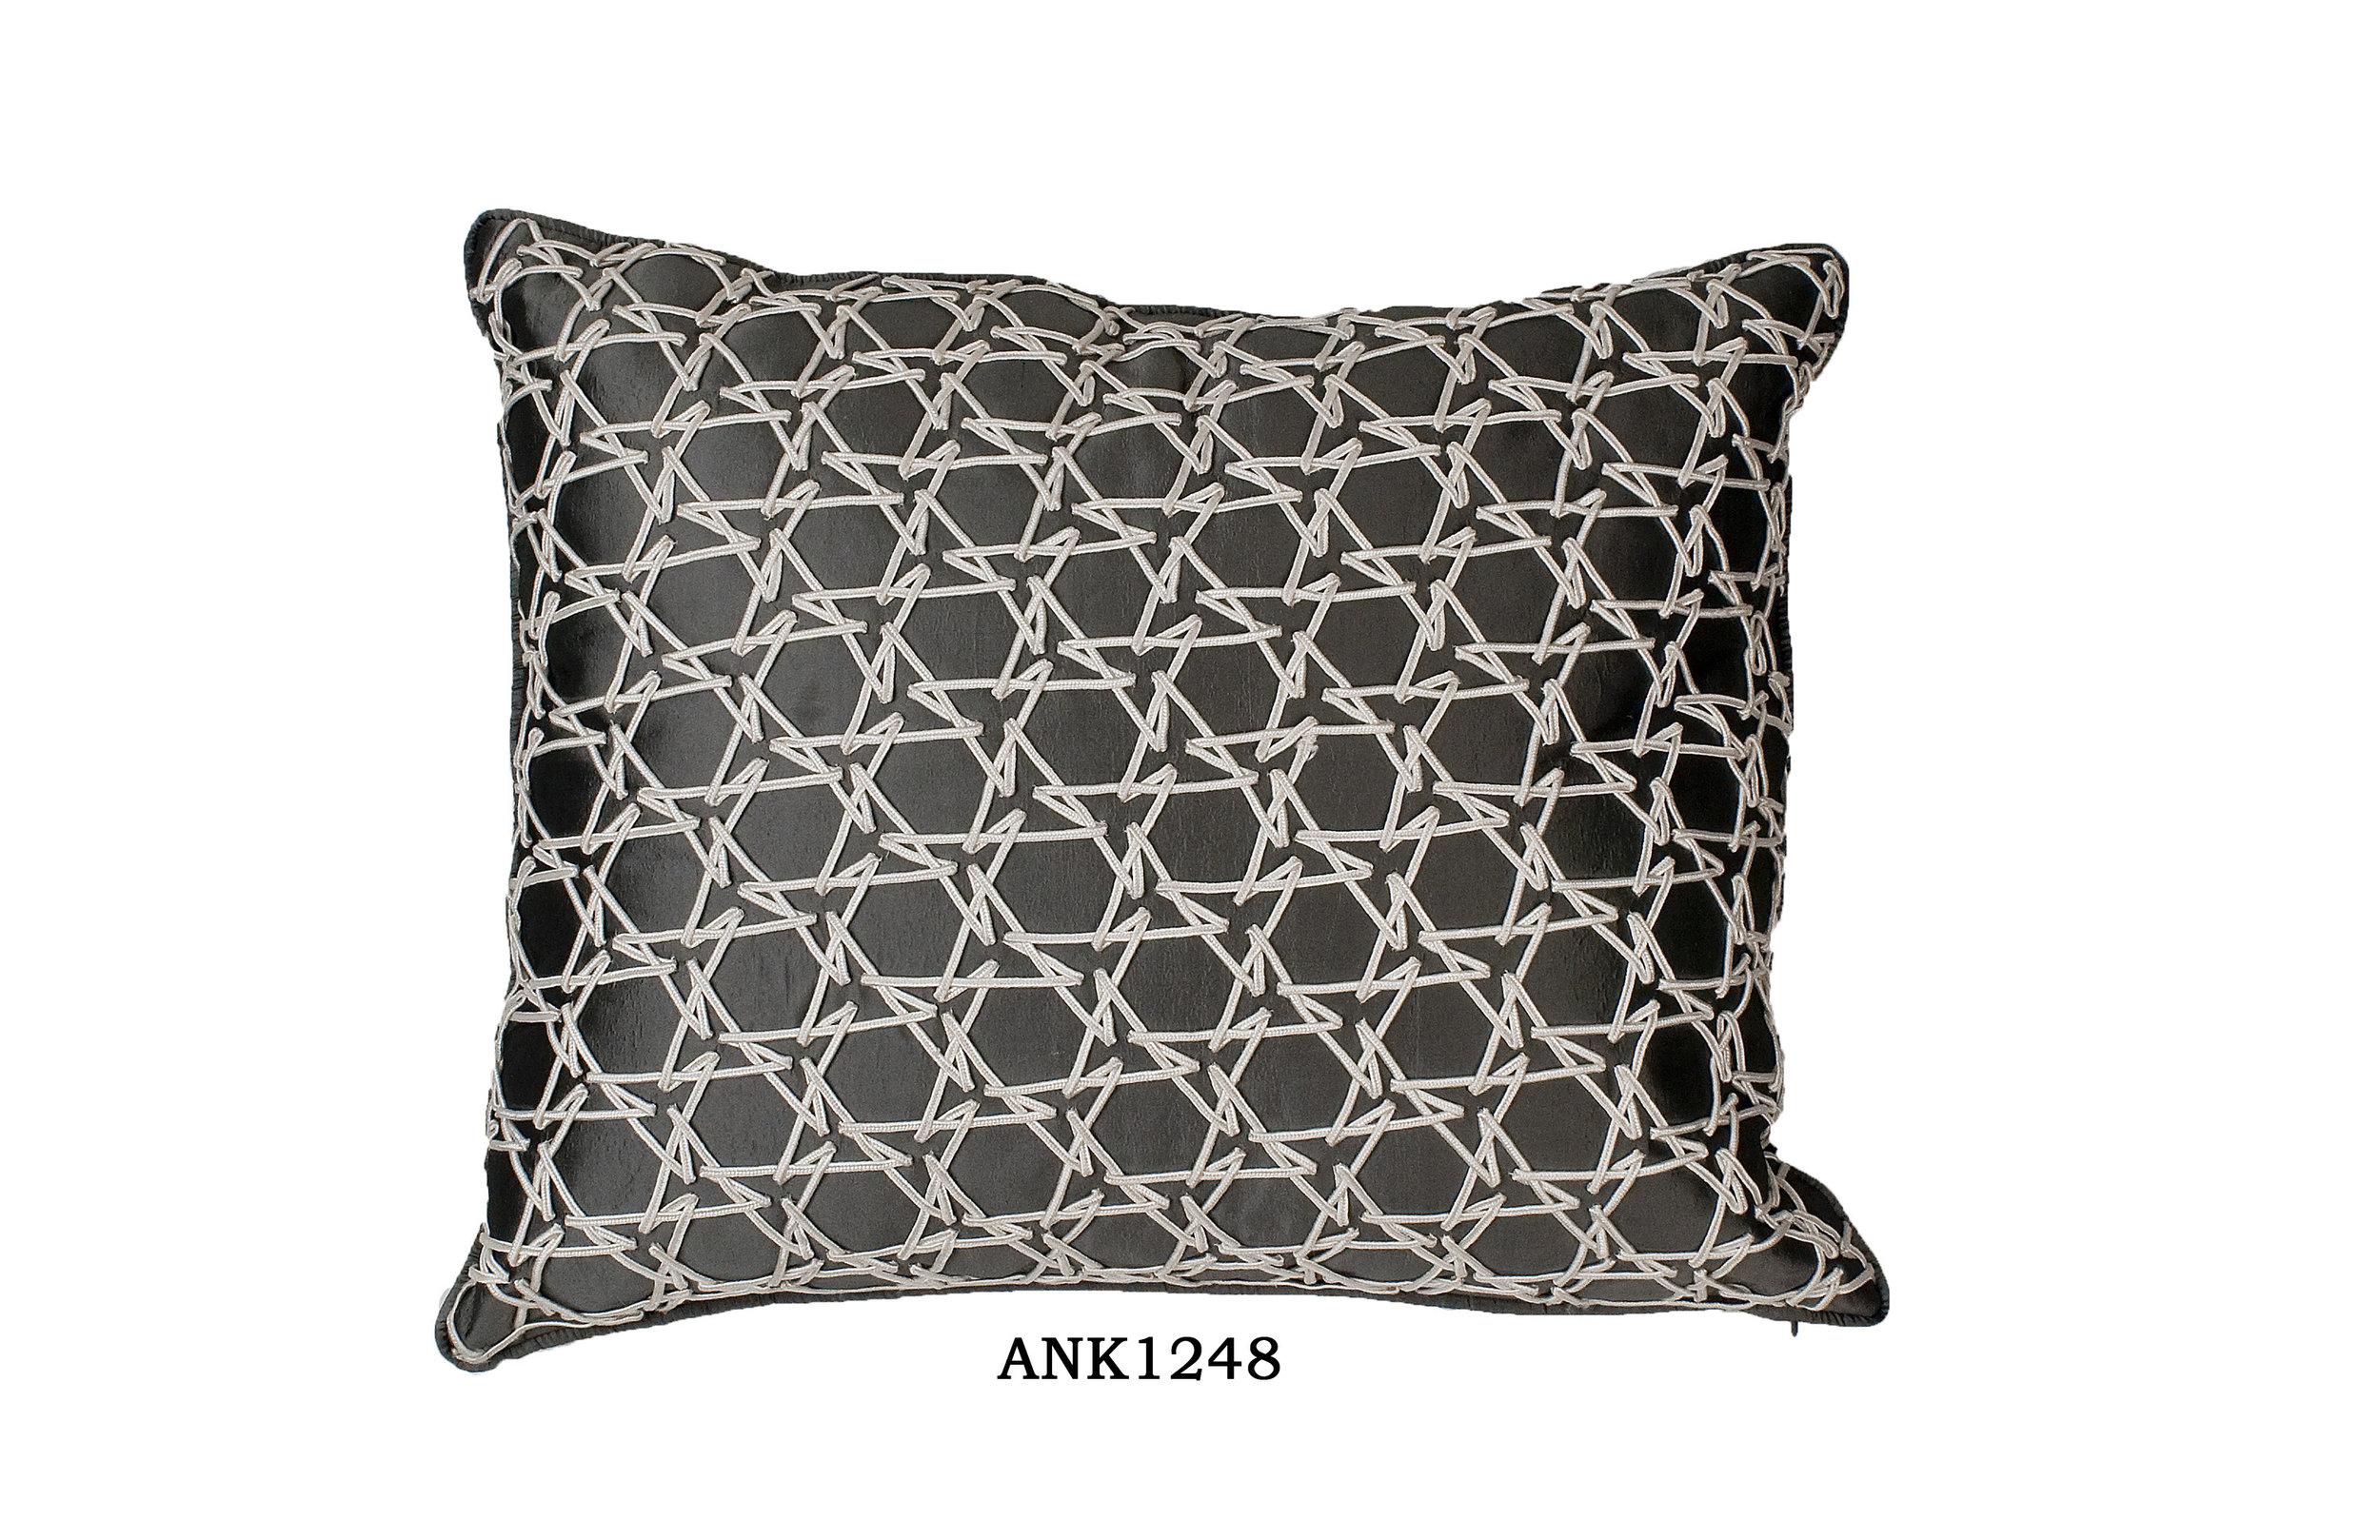 ank1284charcoal copy.jpg